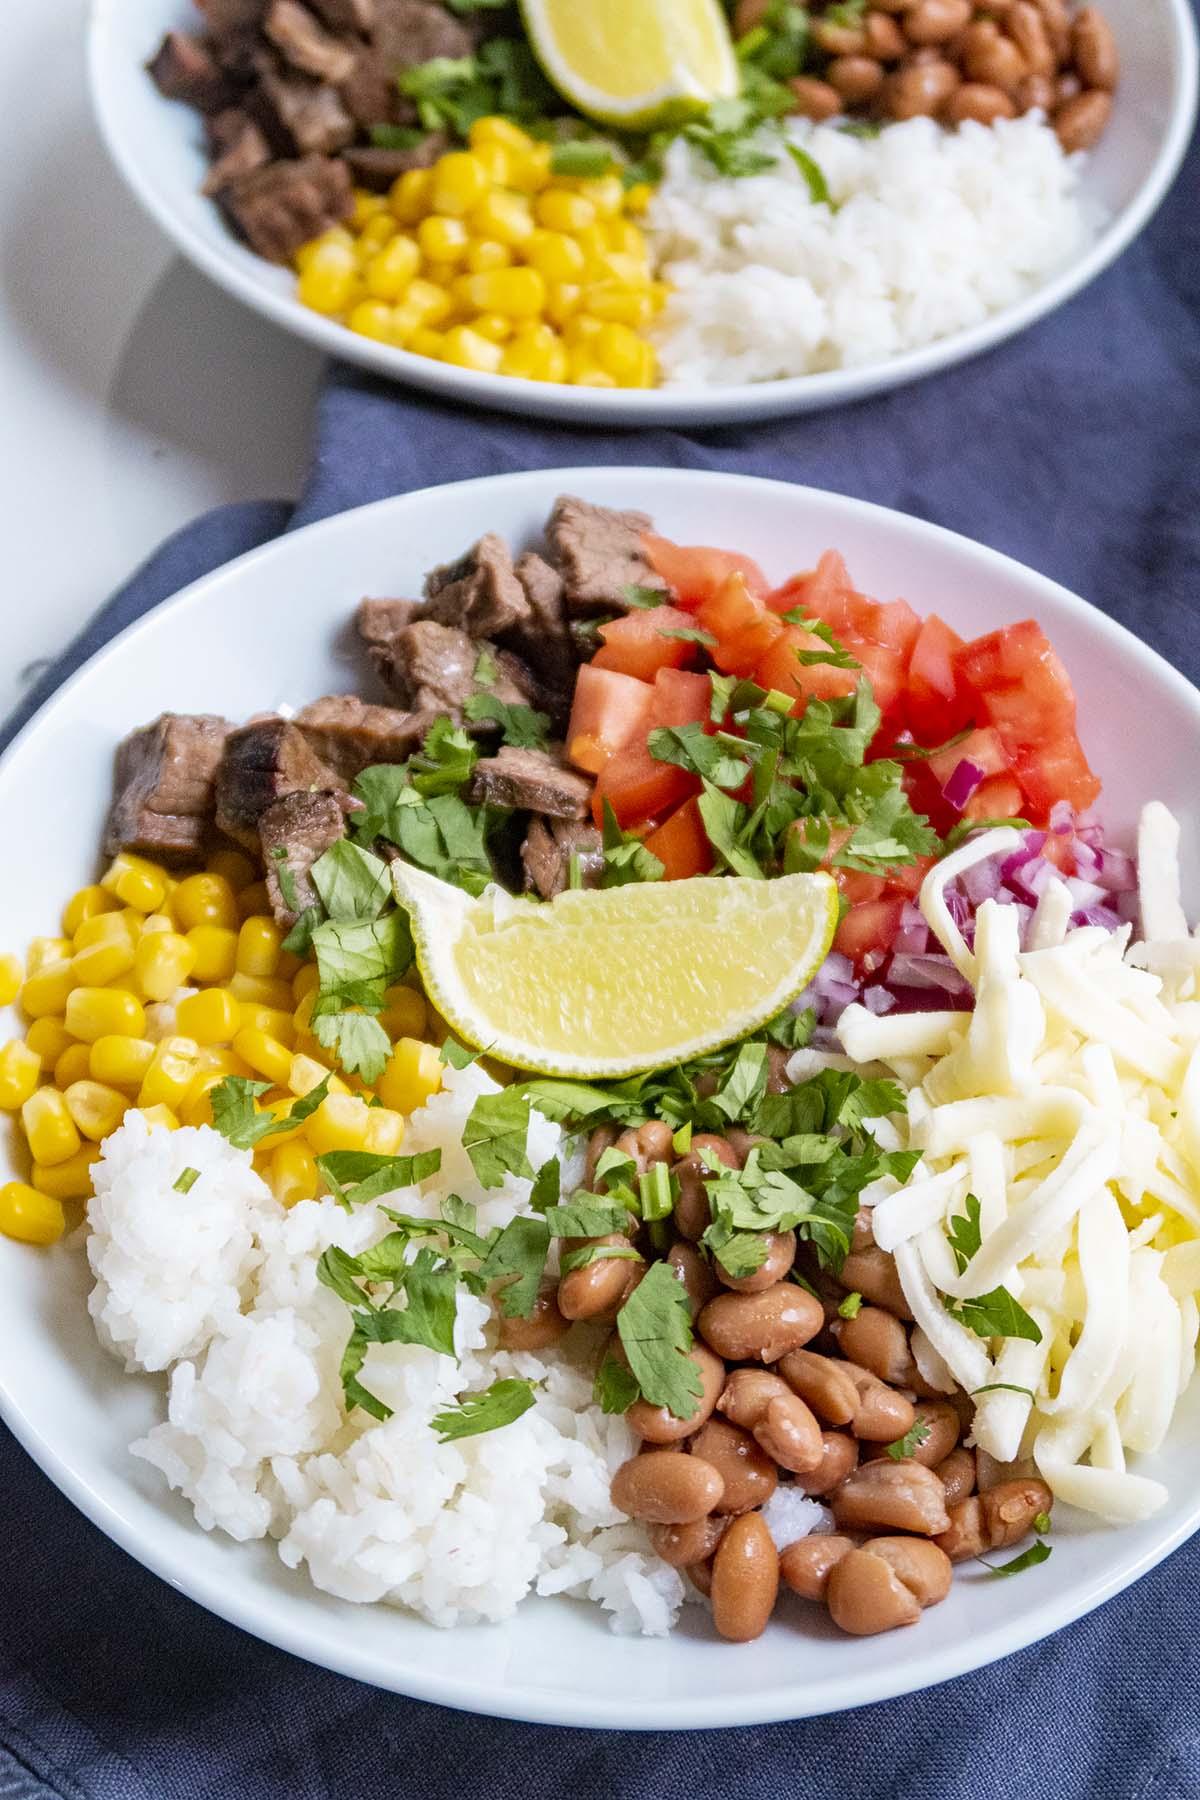 Two bowls of Homemade Burrito Bowl